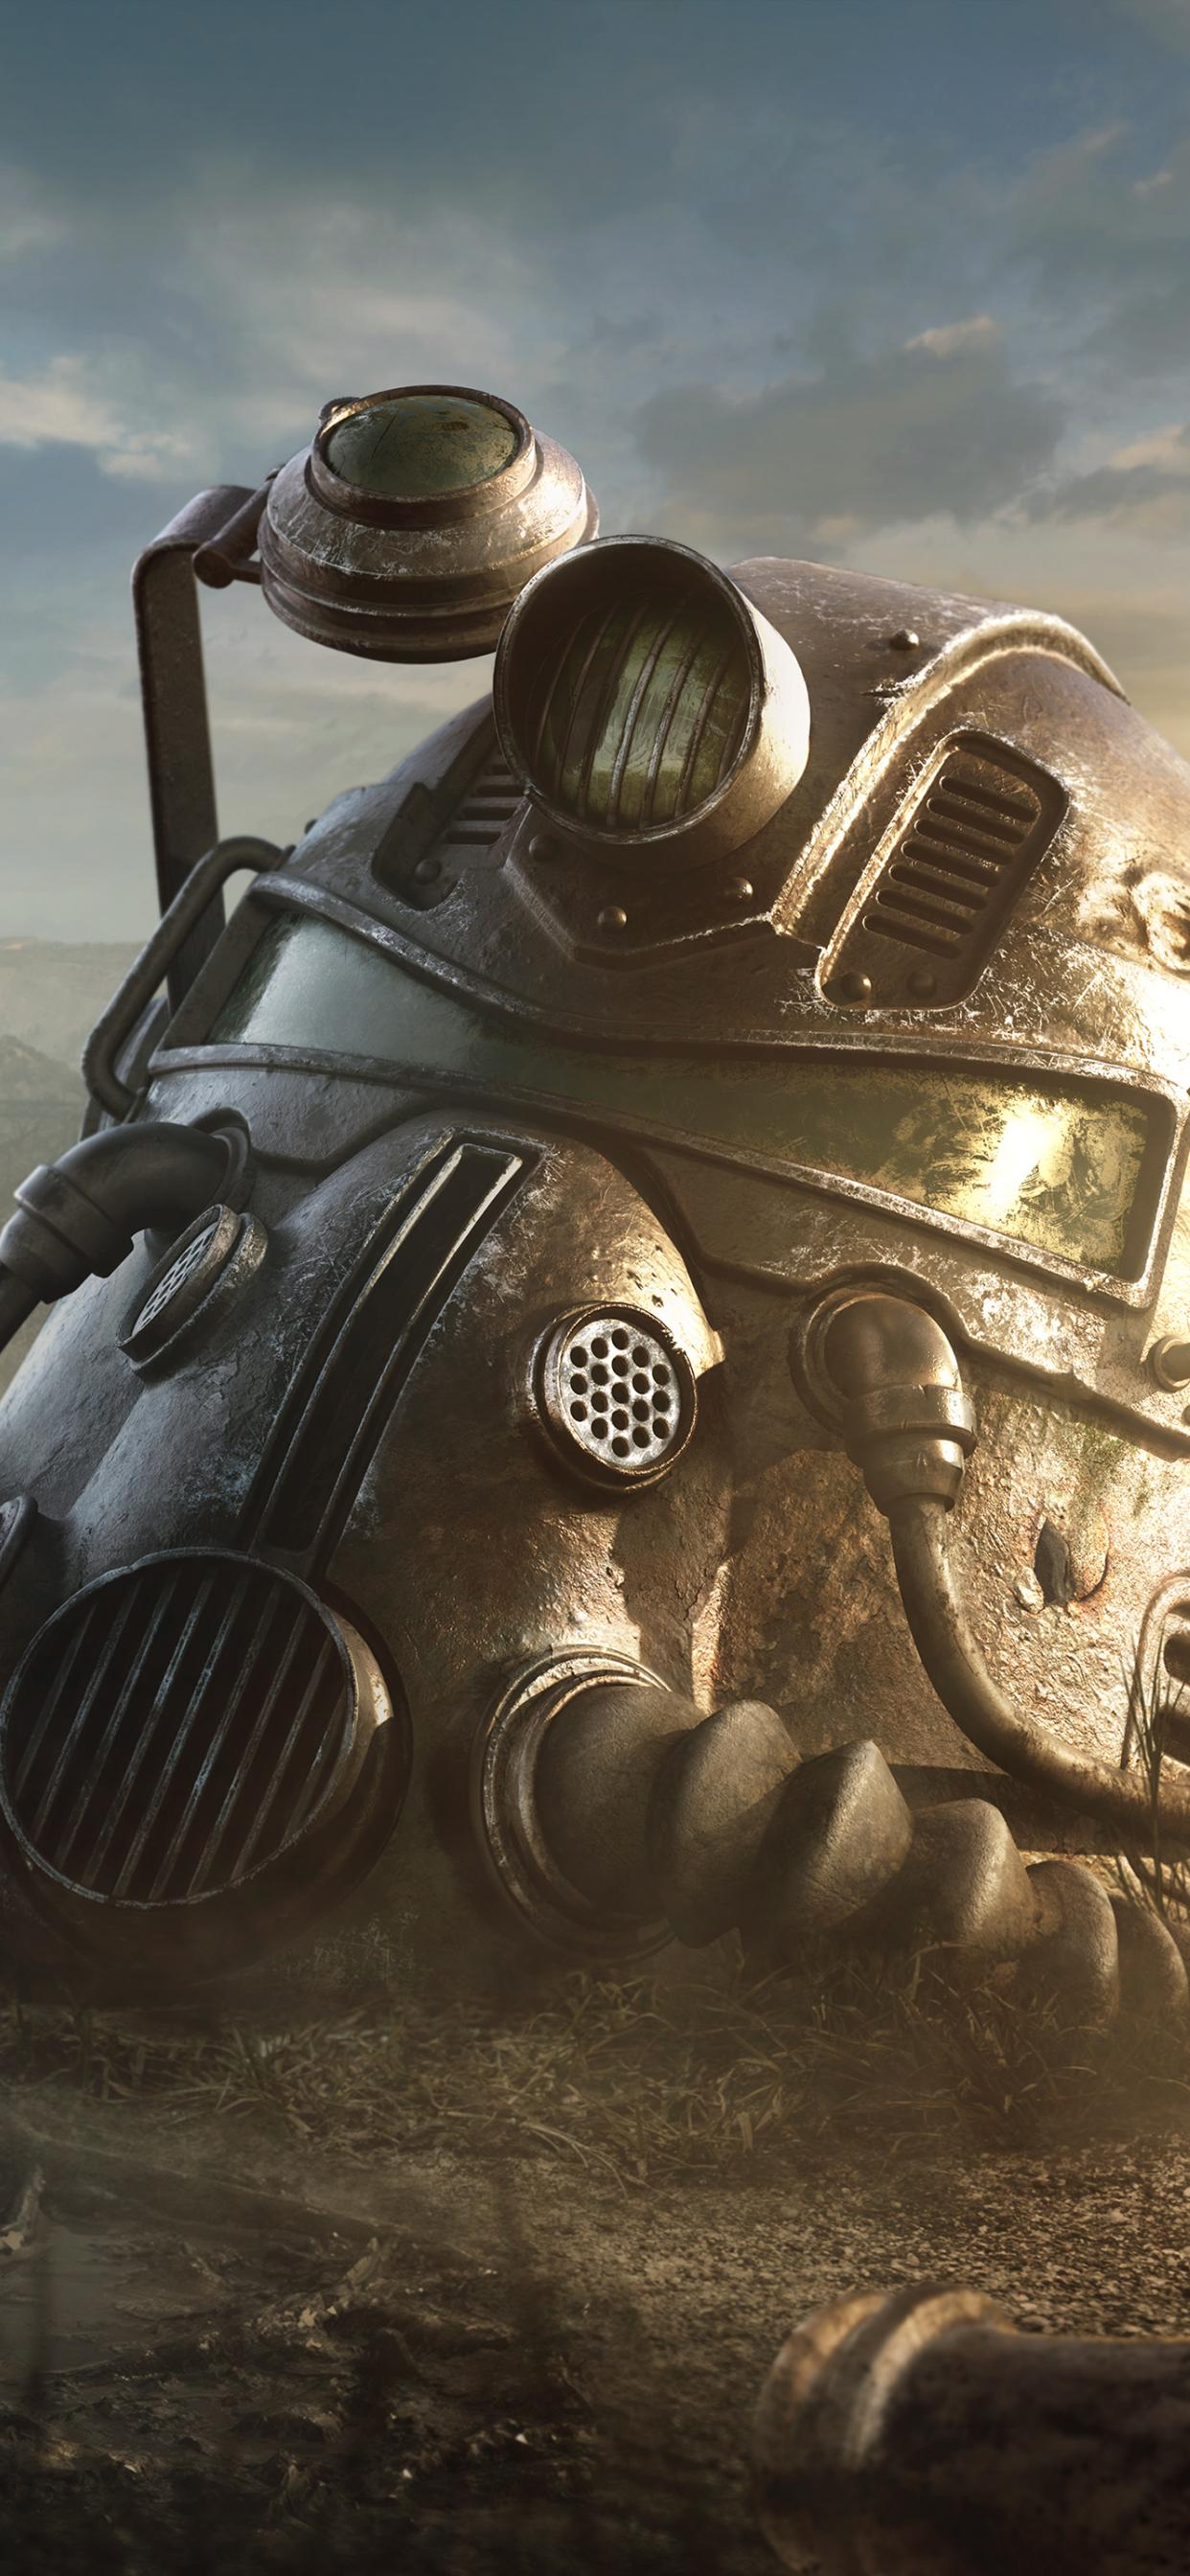 1242x2688 Fallout 76 5k Iphone Xs Max Wallpaper Hd Games 4k